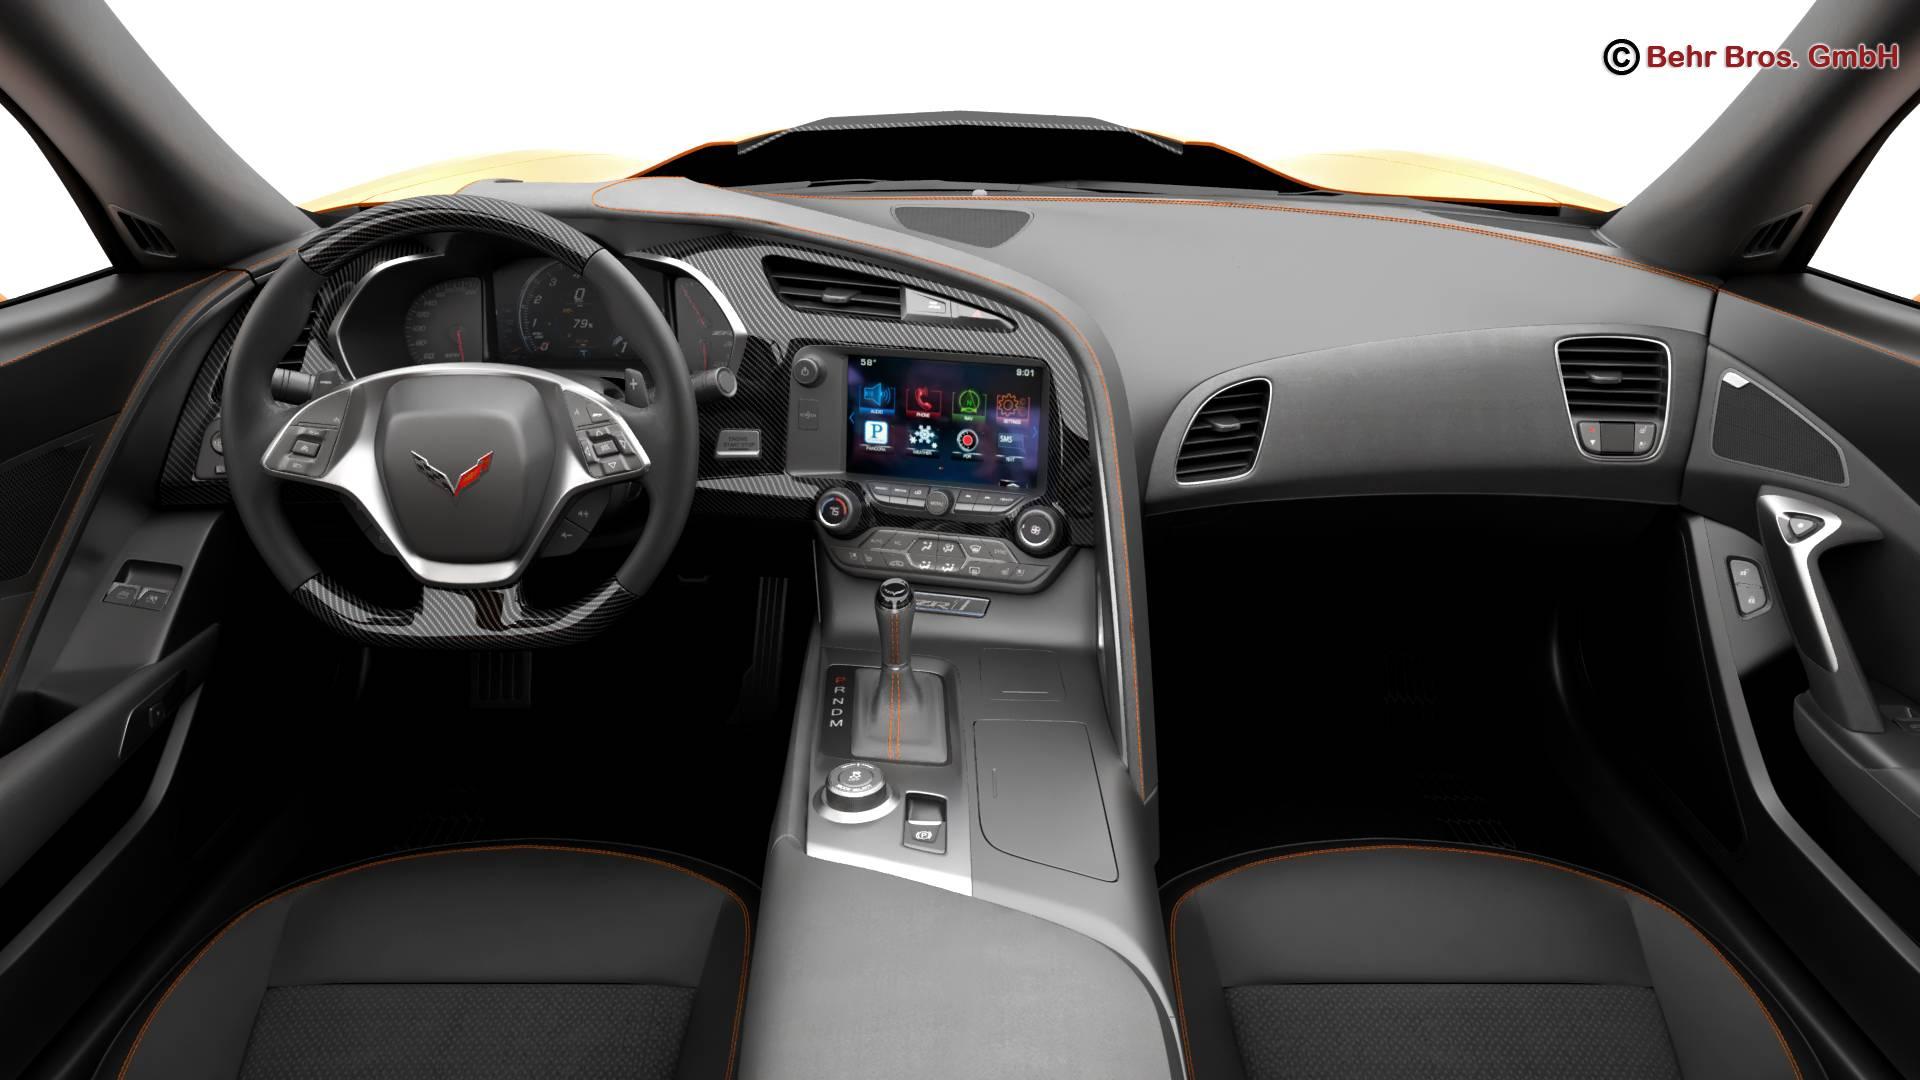 chevrolet corvette zr1 2019 3d model 3ds max fbx c4d lwo ma mb obj 275979